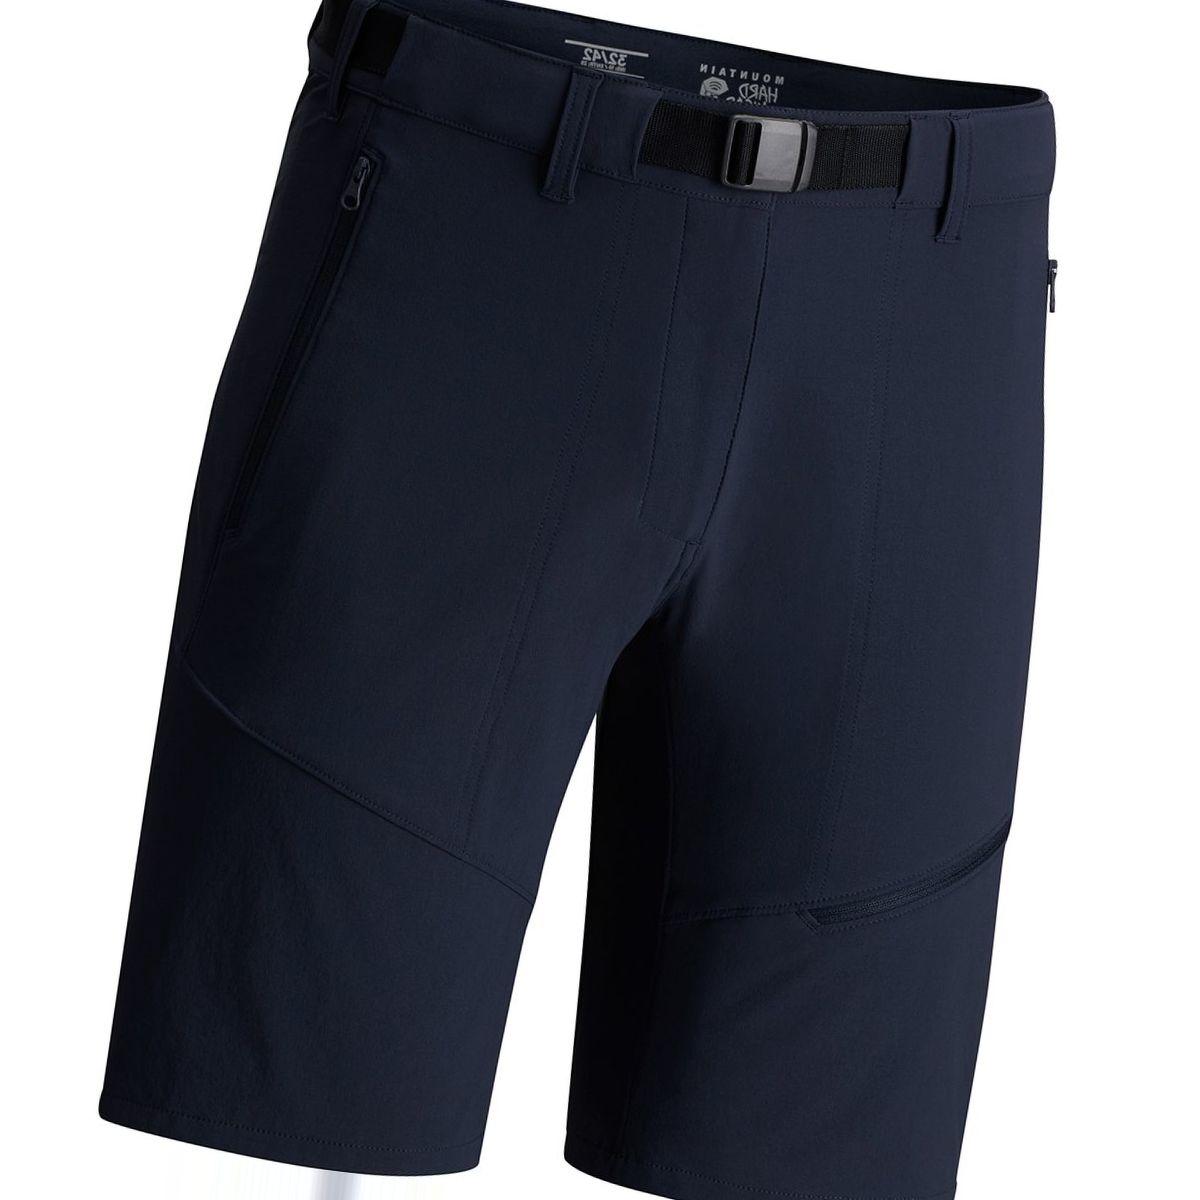 Mountain Hardwear Chockstone Hike Short - Men's